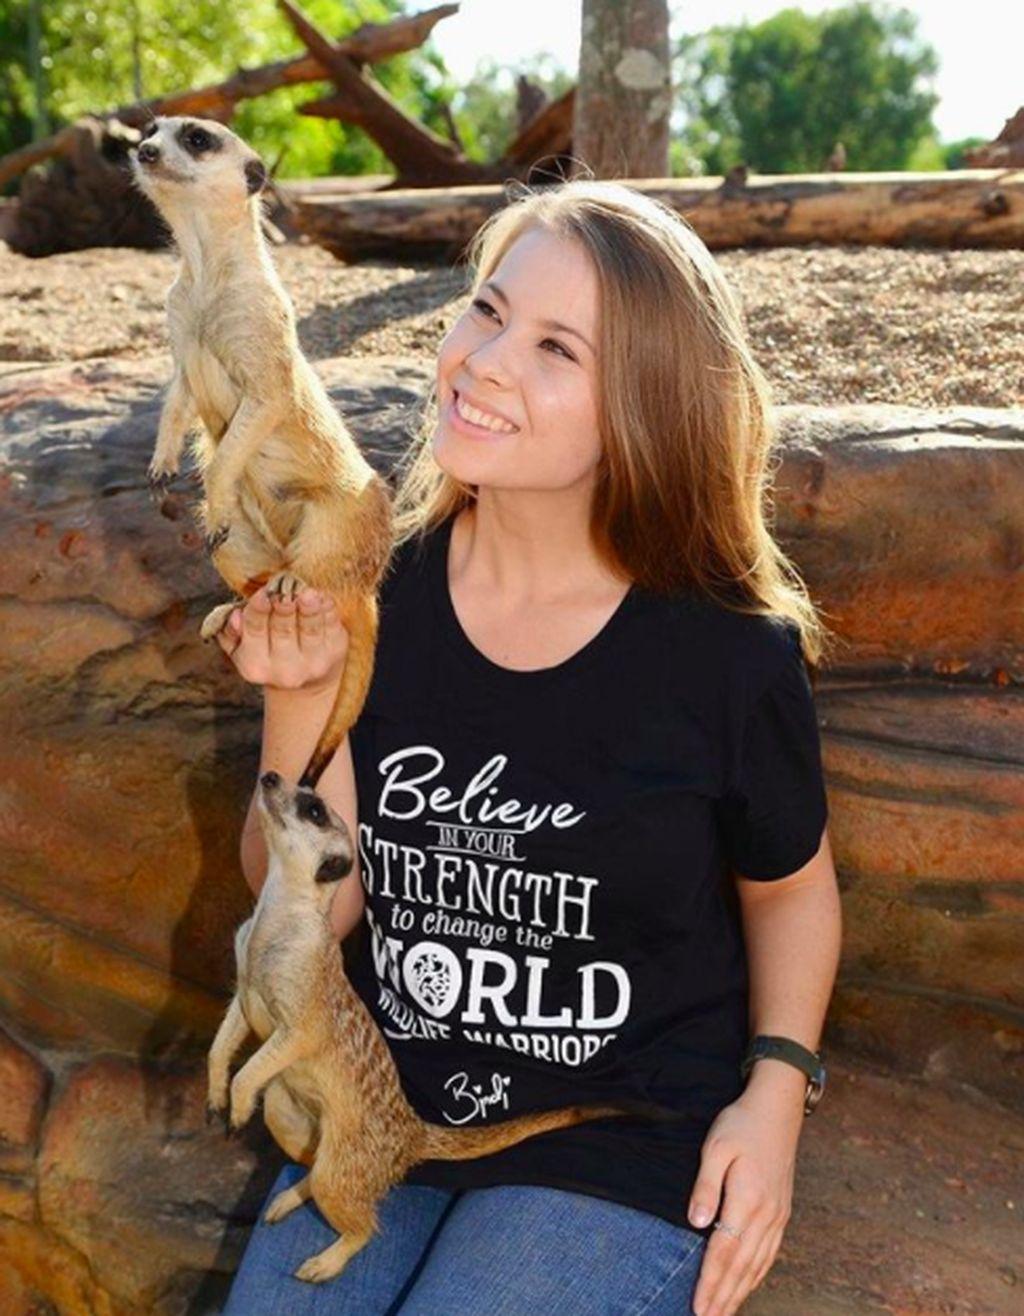 Bindi Sue Irwin yang lahir pada tahun 1998 adalah putri dari Steve Irwin, pecinta satwa terkenal asal Australia. Bindi yang sejak kecil akrab dengan binatang pun mengikuti jejak ayahnya. Foto: Instagram